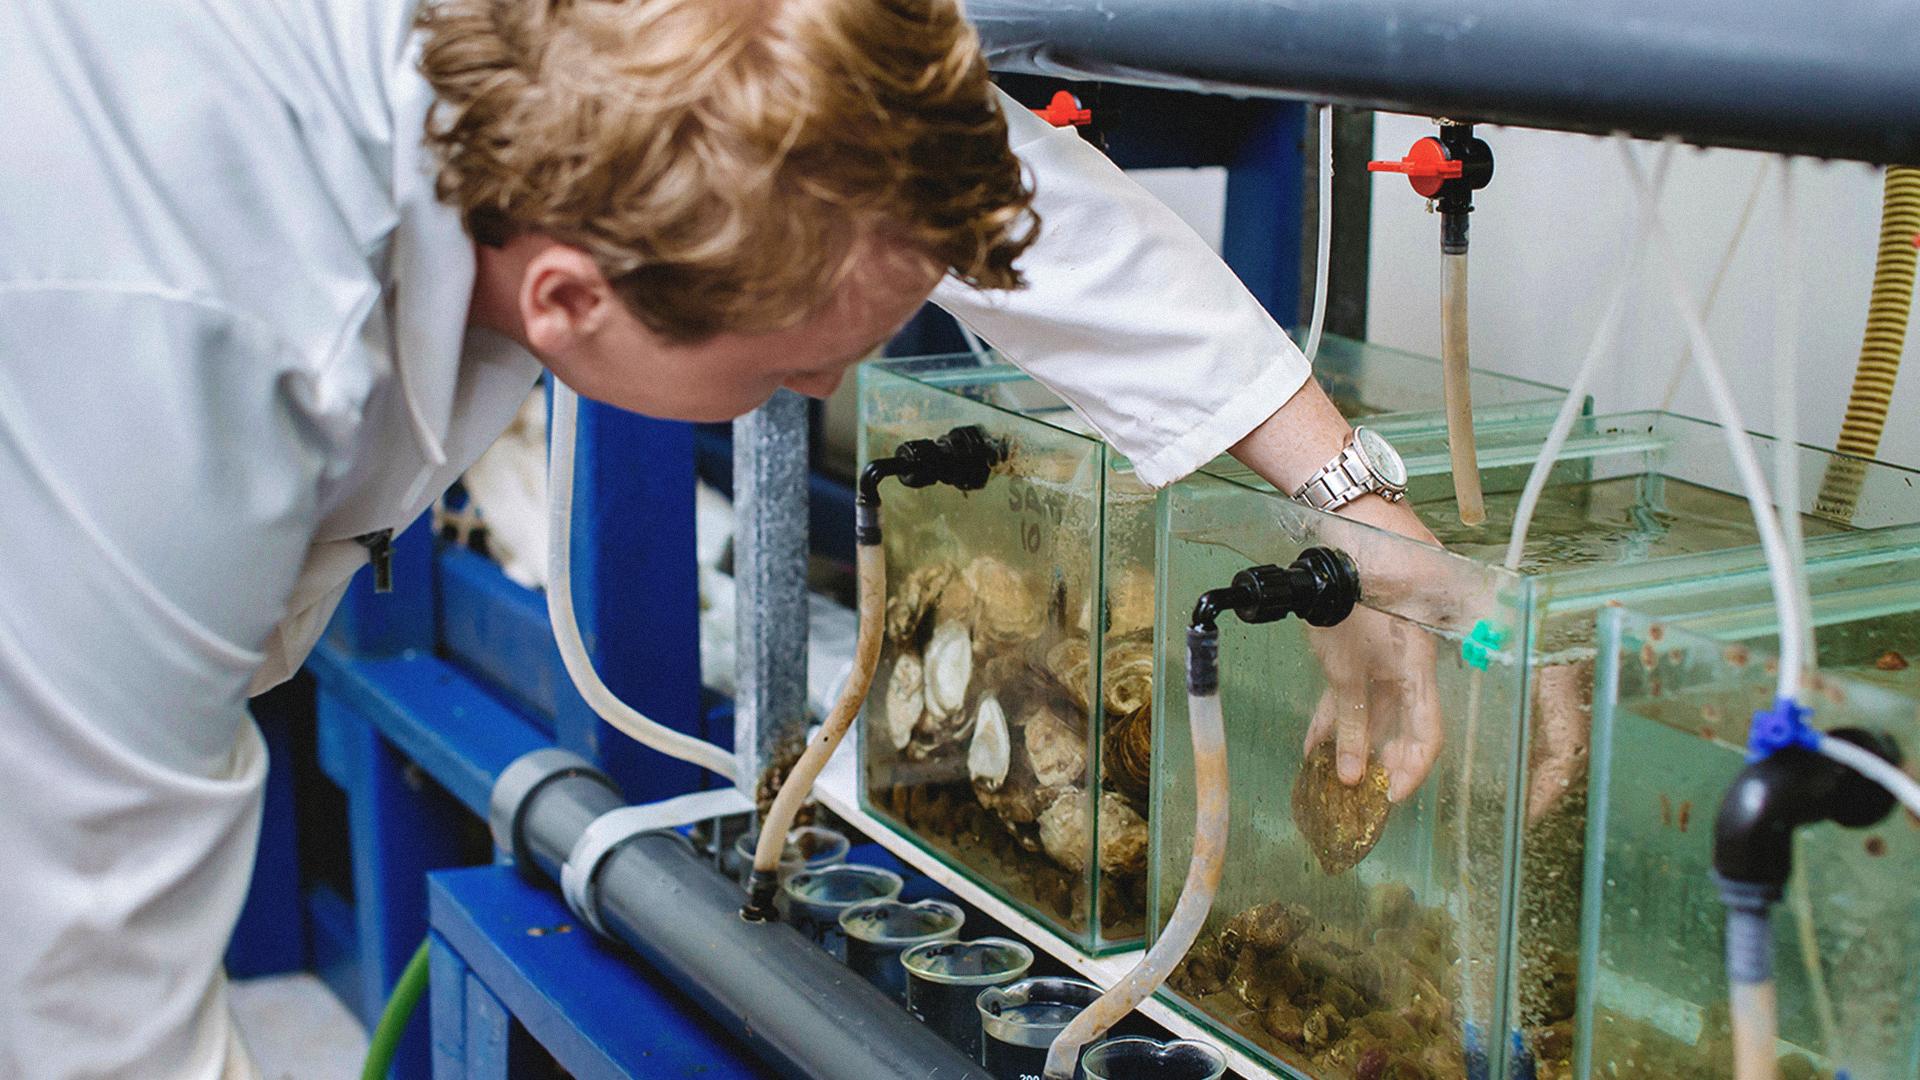 Luke Helmer Restoring **lost** oyster reefs